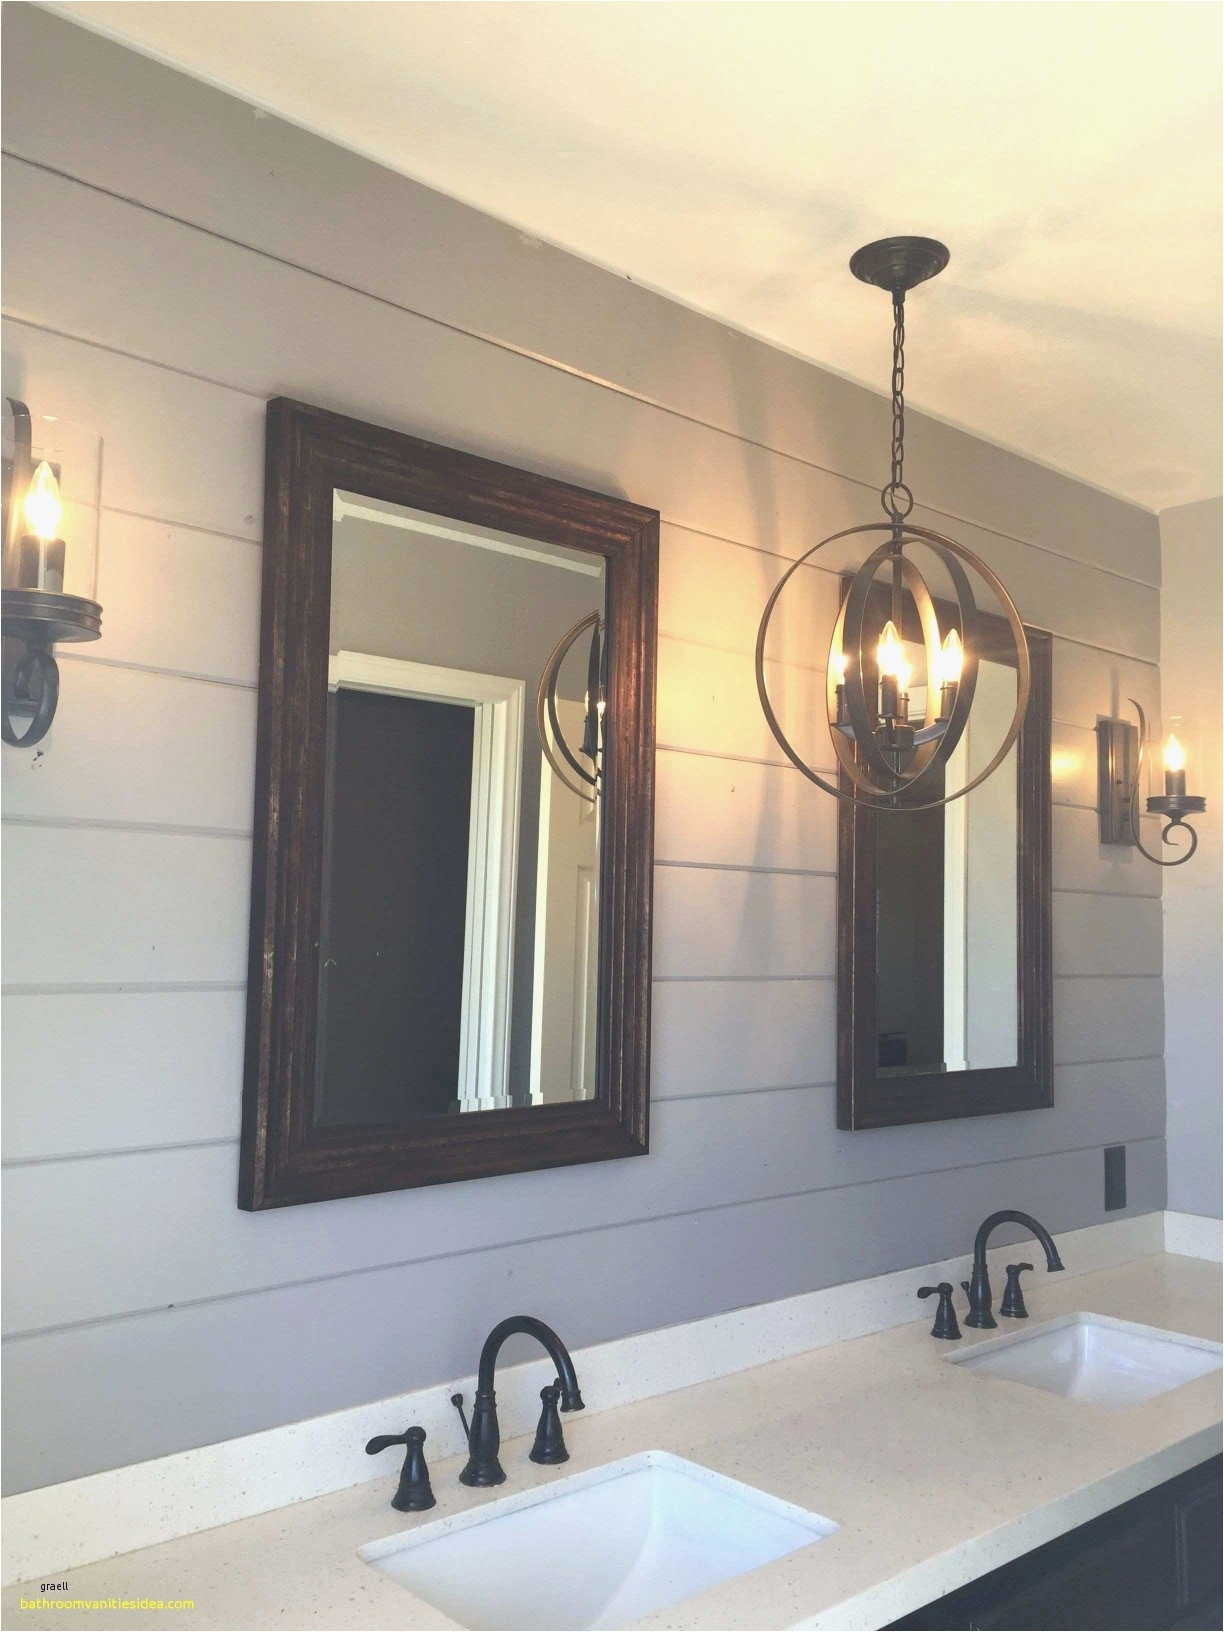 Enery Saving Light Beautiful Best Light Bulbs for Bathroom